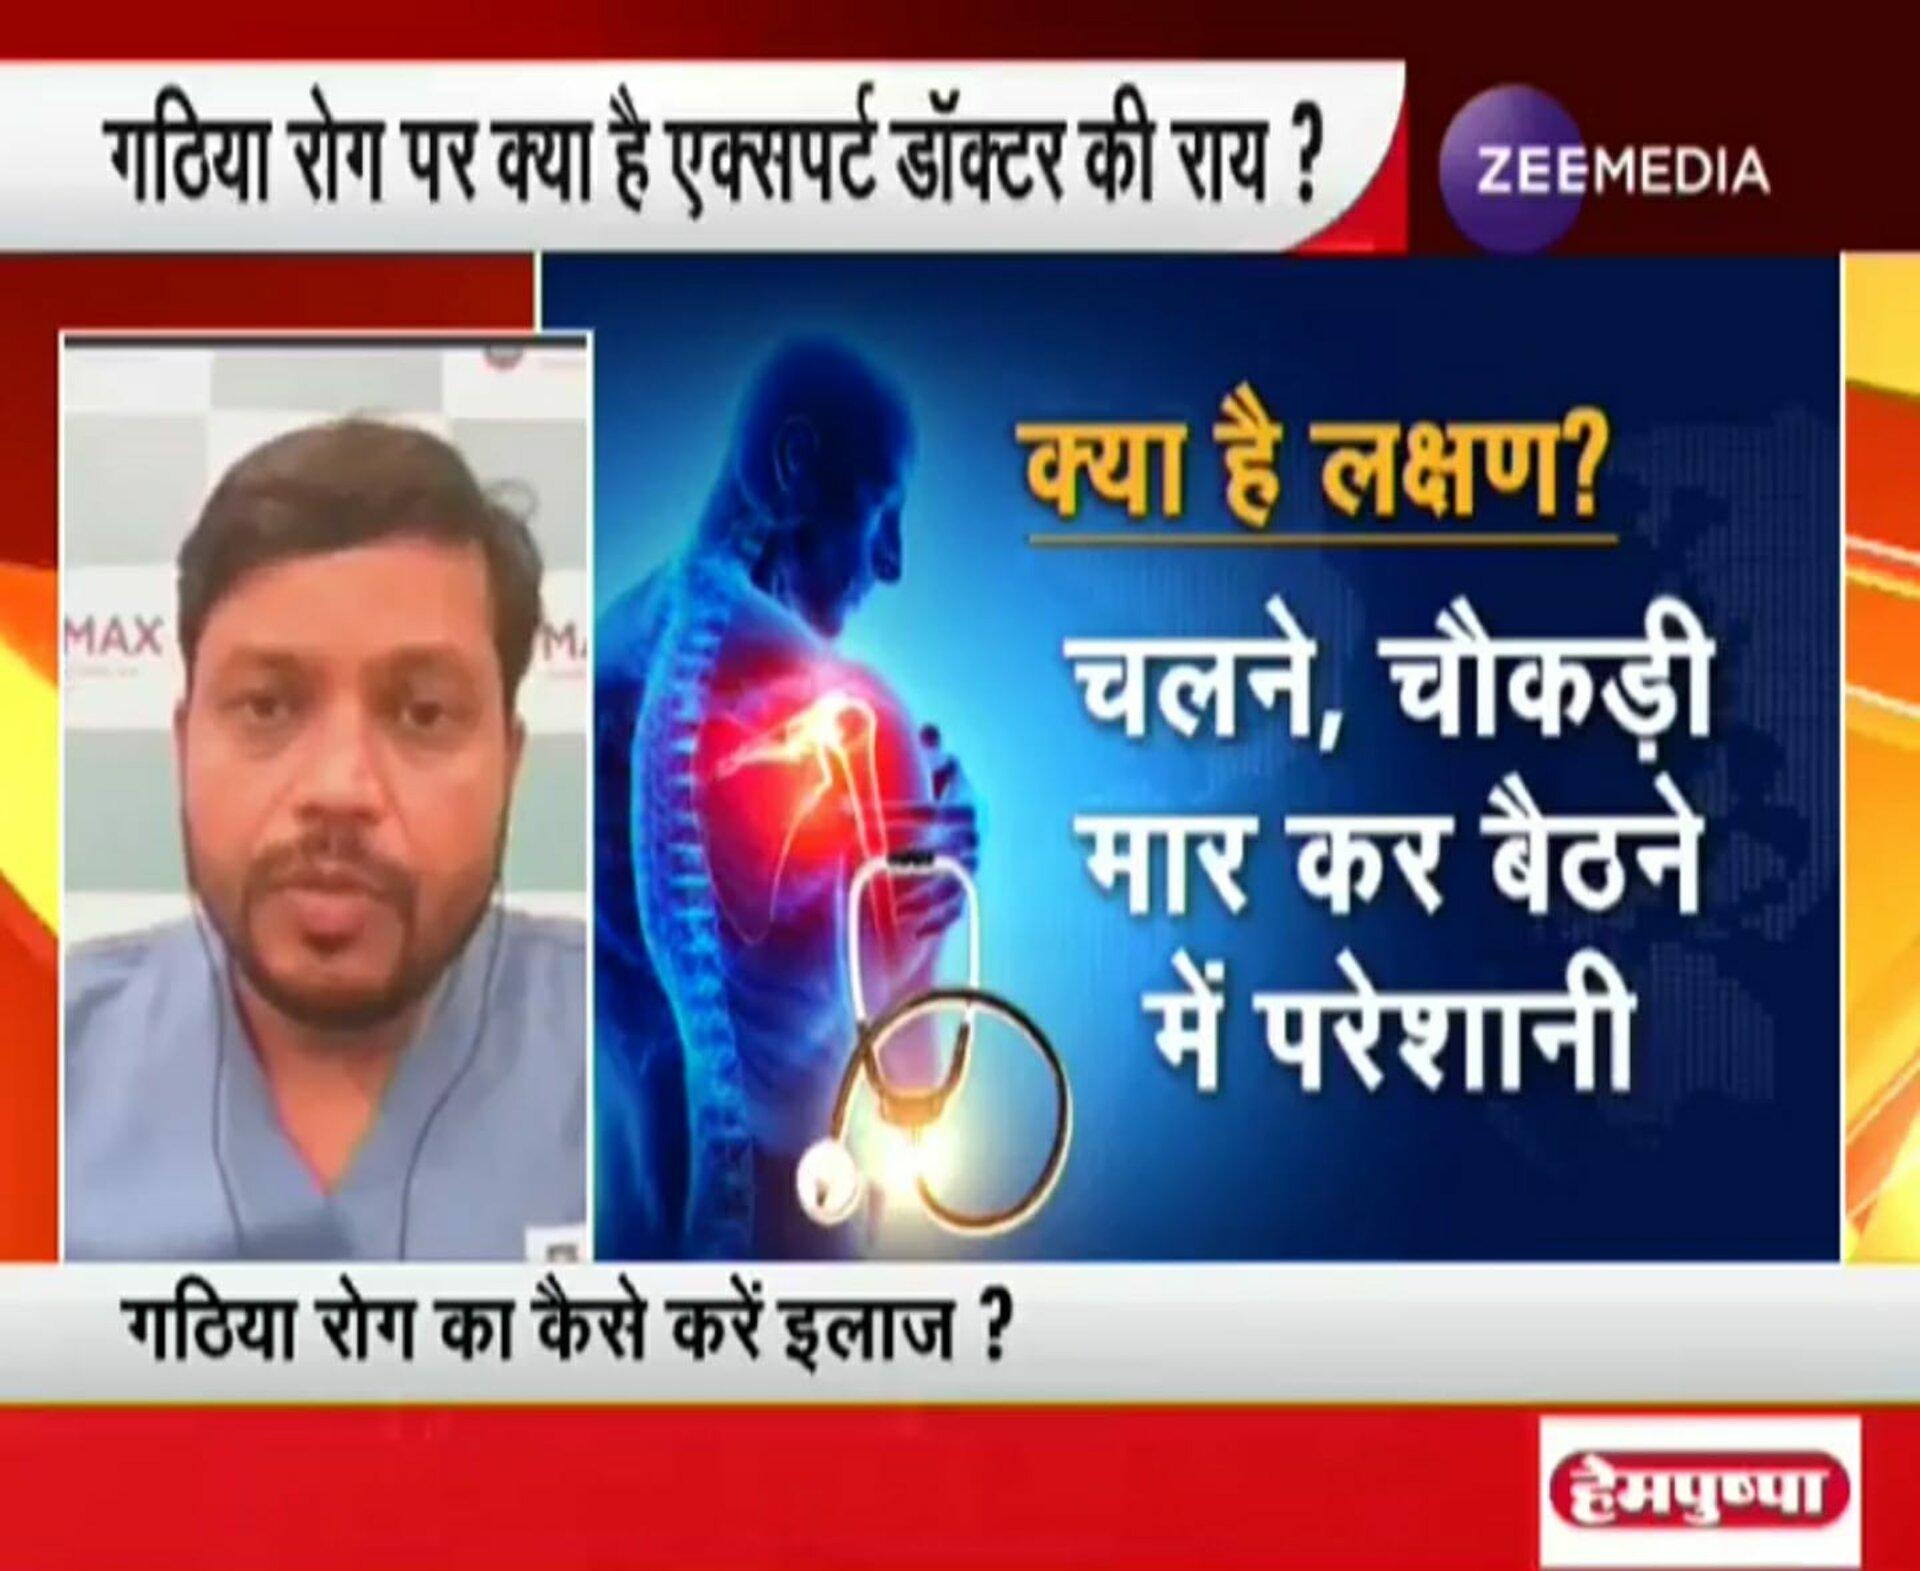 Live health talk on ZEE TV news by Dr. Gaurav Gupta.